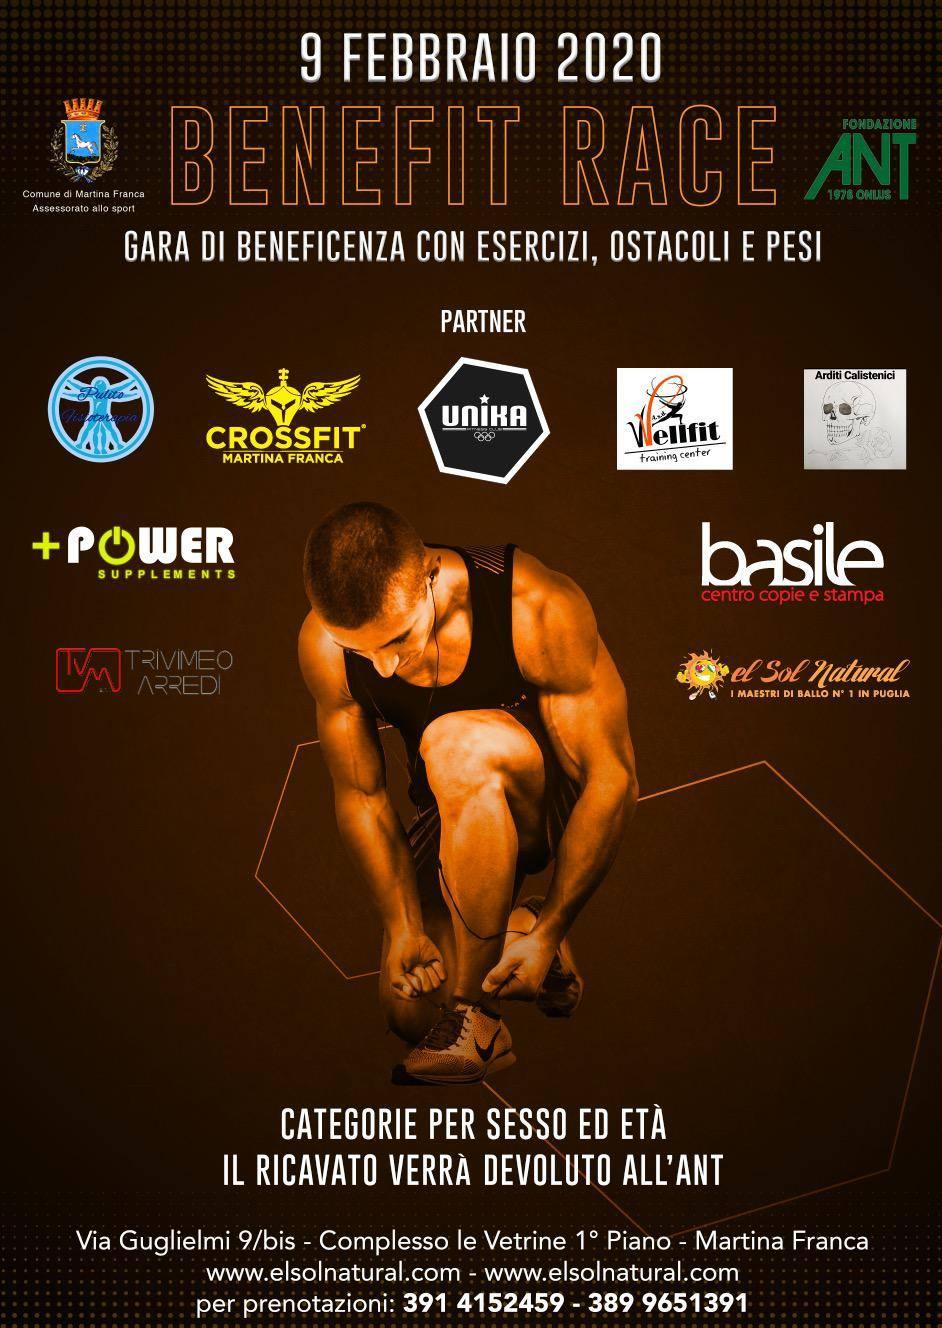 Ant Martina Franca benefit race. fitcross e solidarietà - valle d'itria news